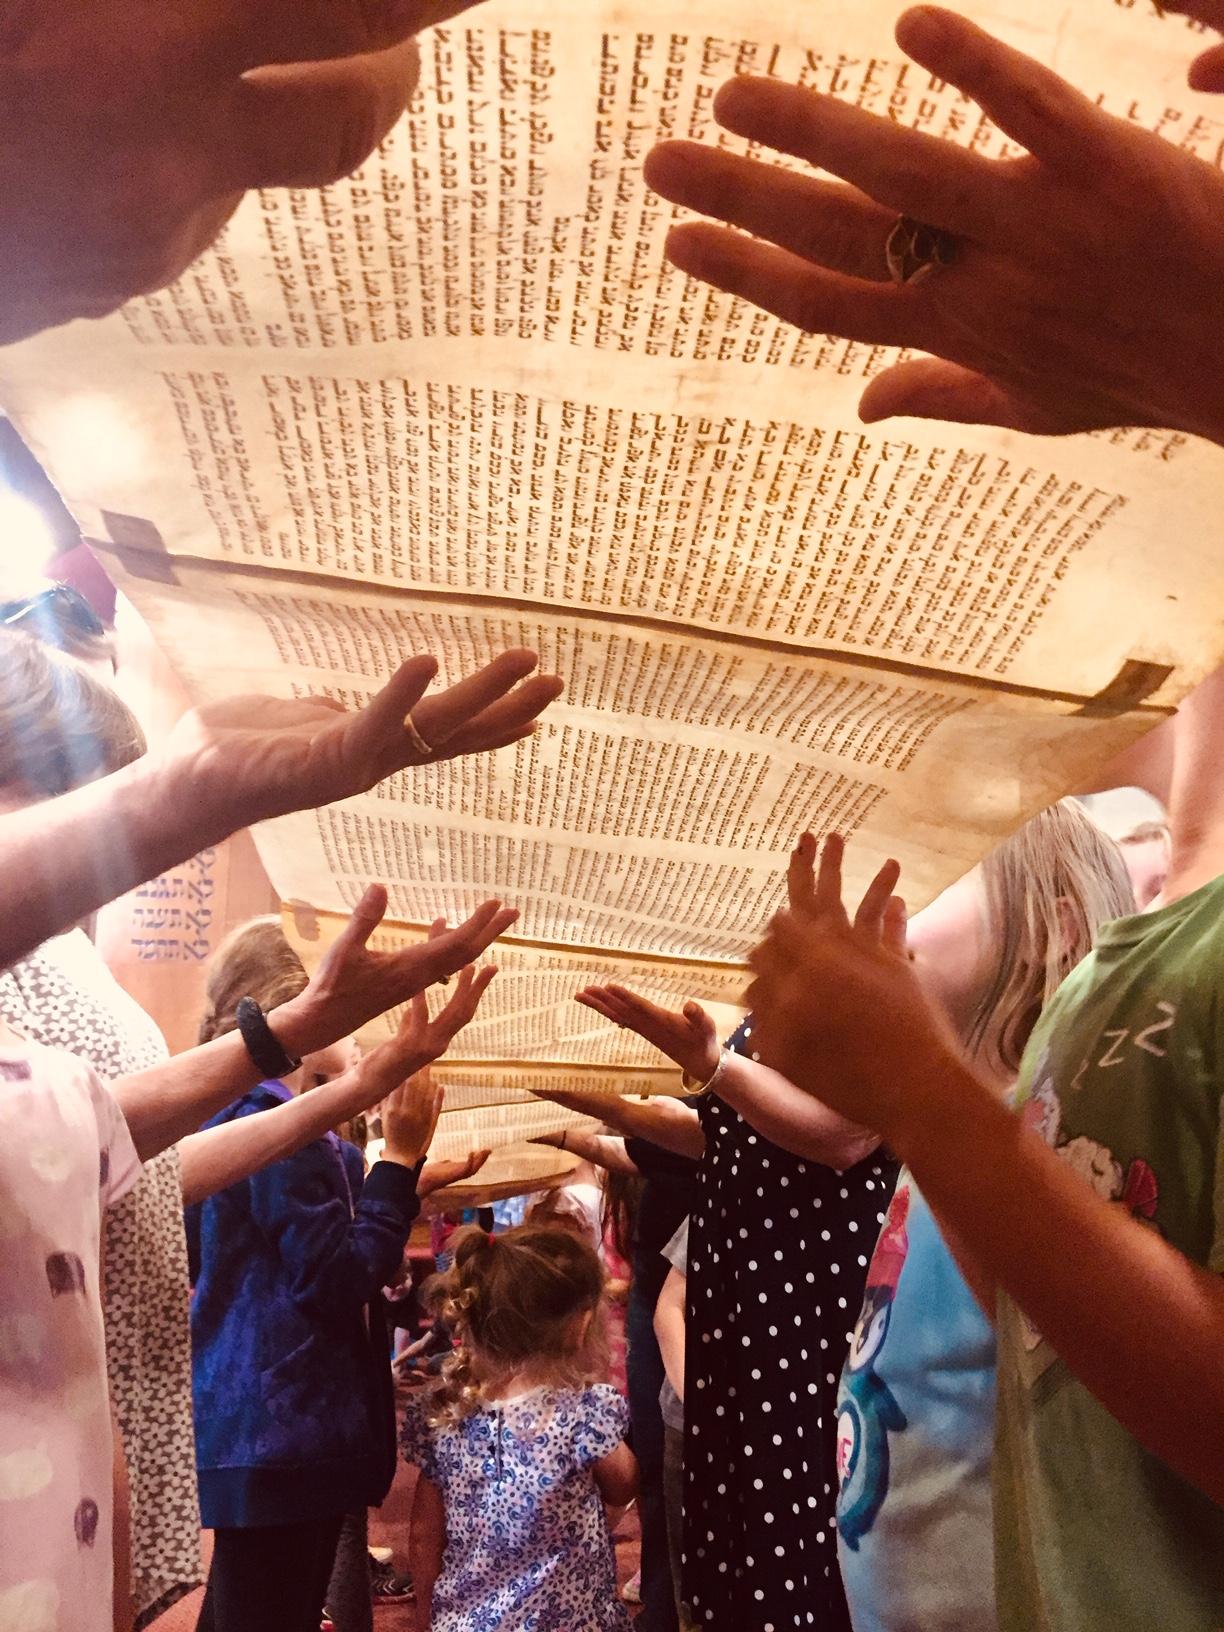 Torah unrolled hands lifting